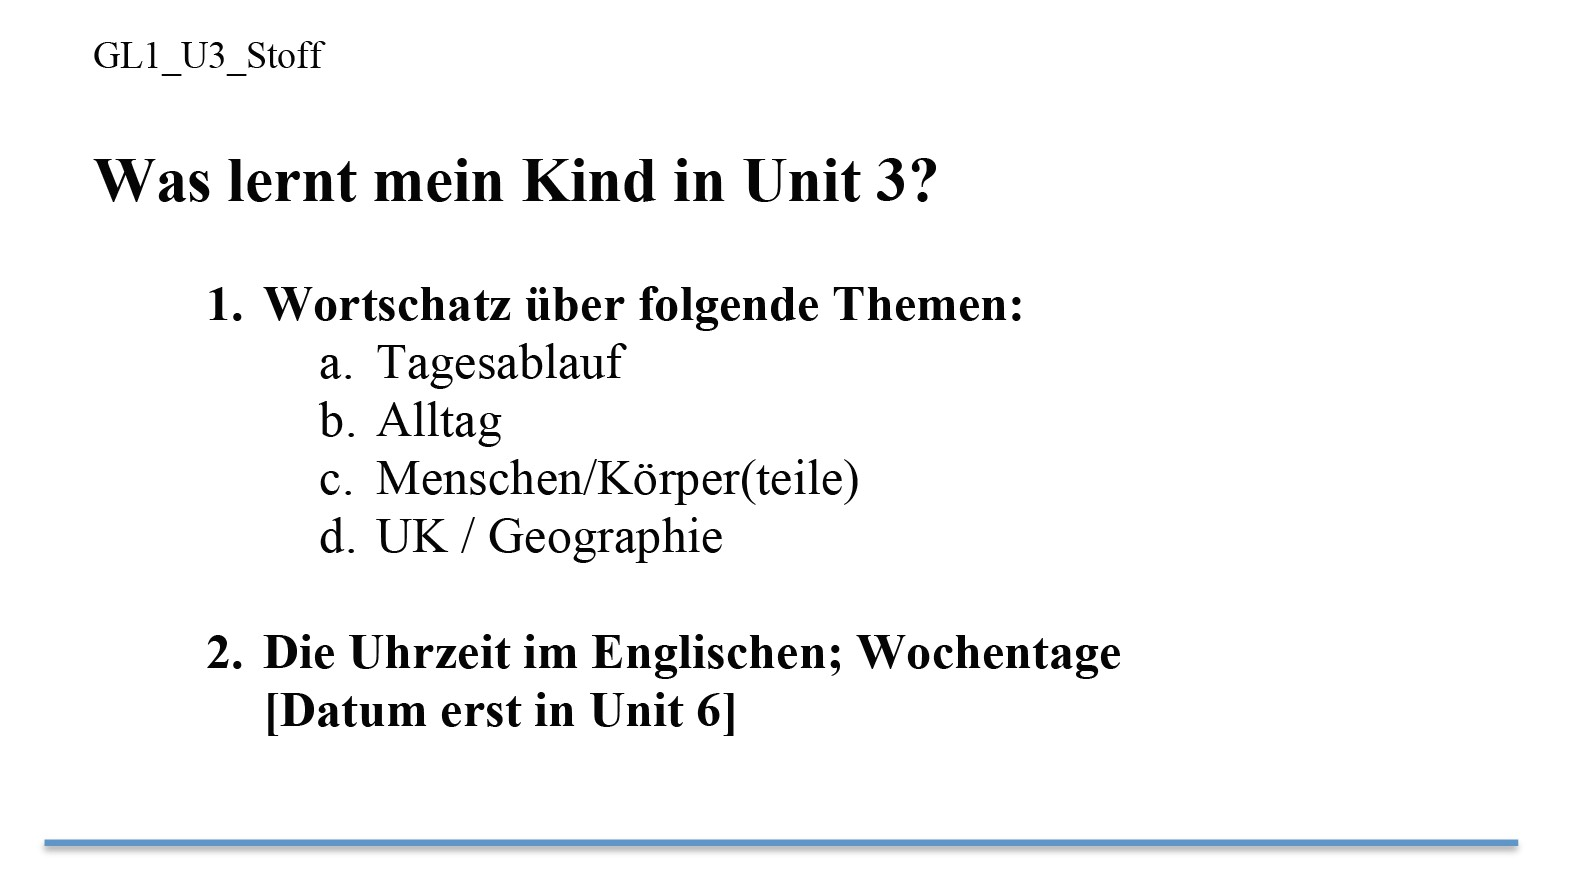 GL1_U3_stoff1.